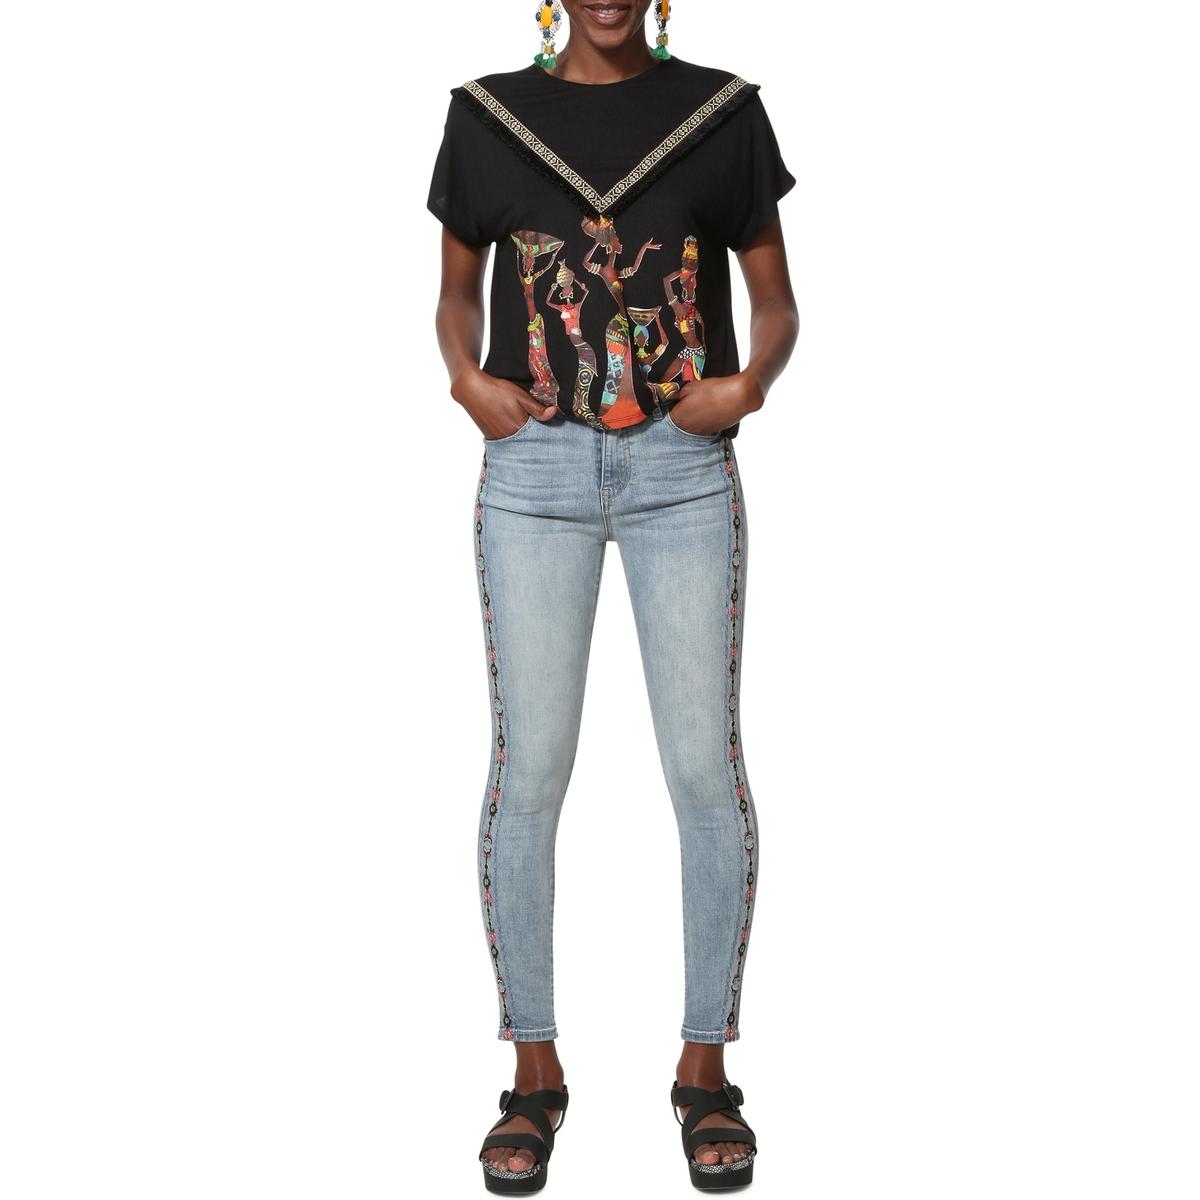 Camiseta Yamila vaporosa con cuello redondo, estampada